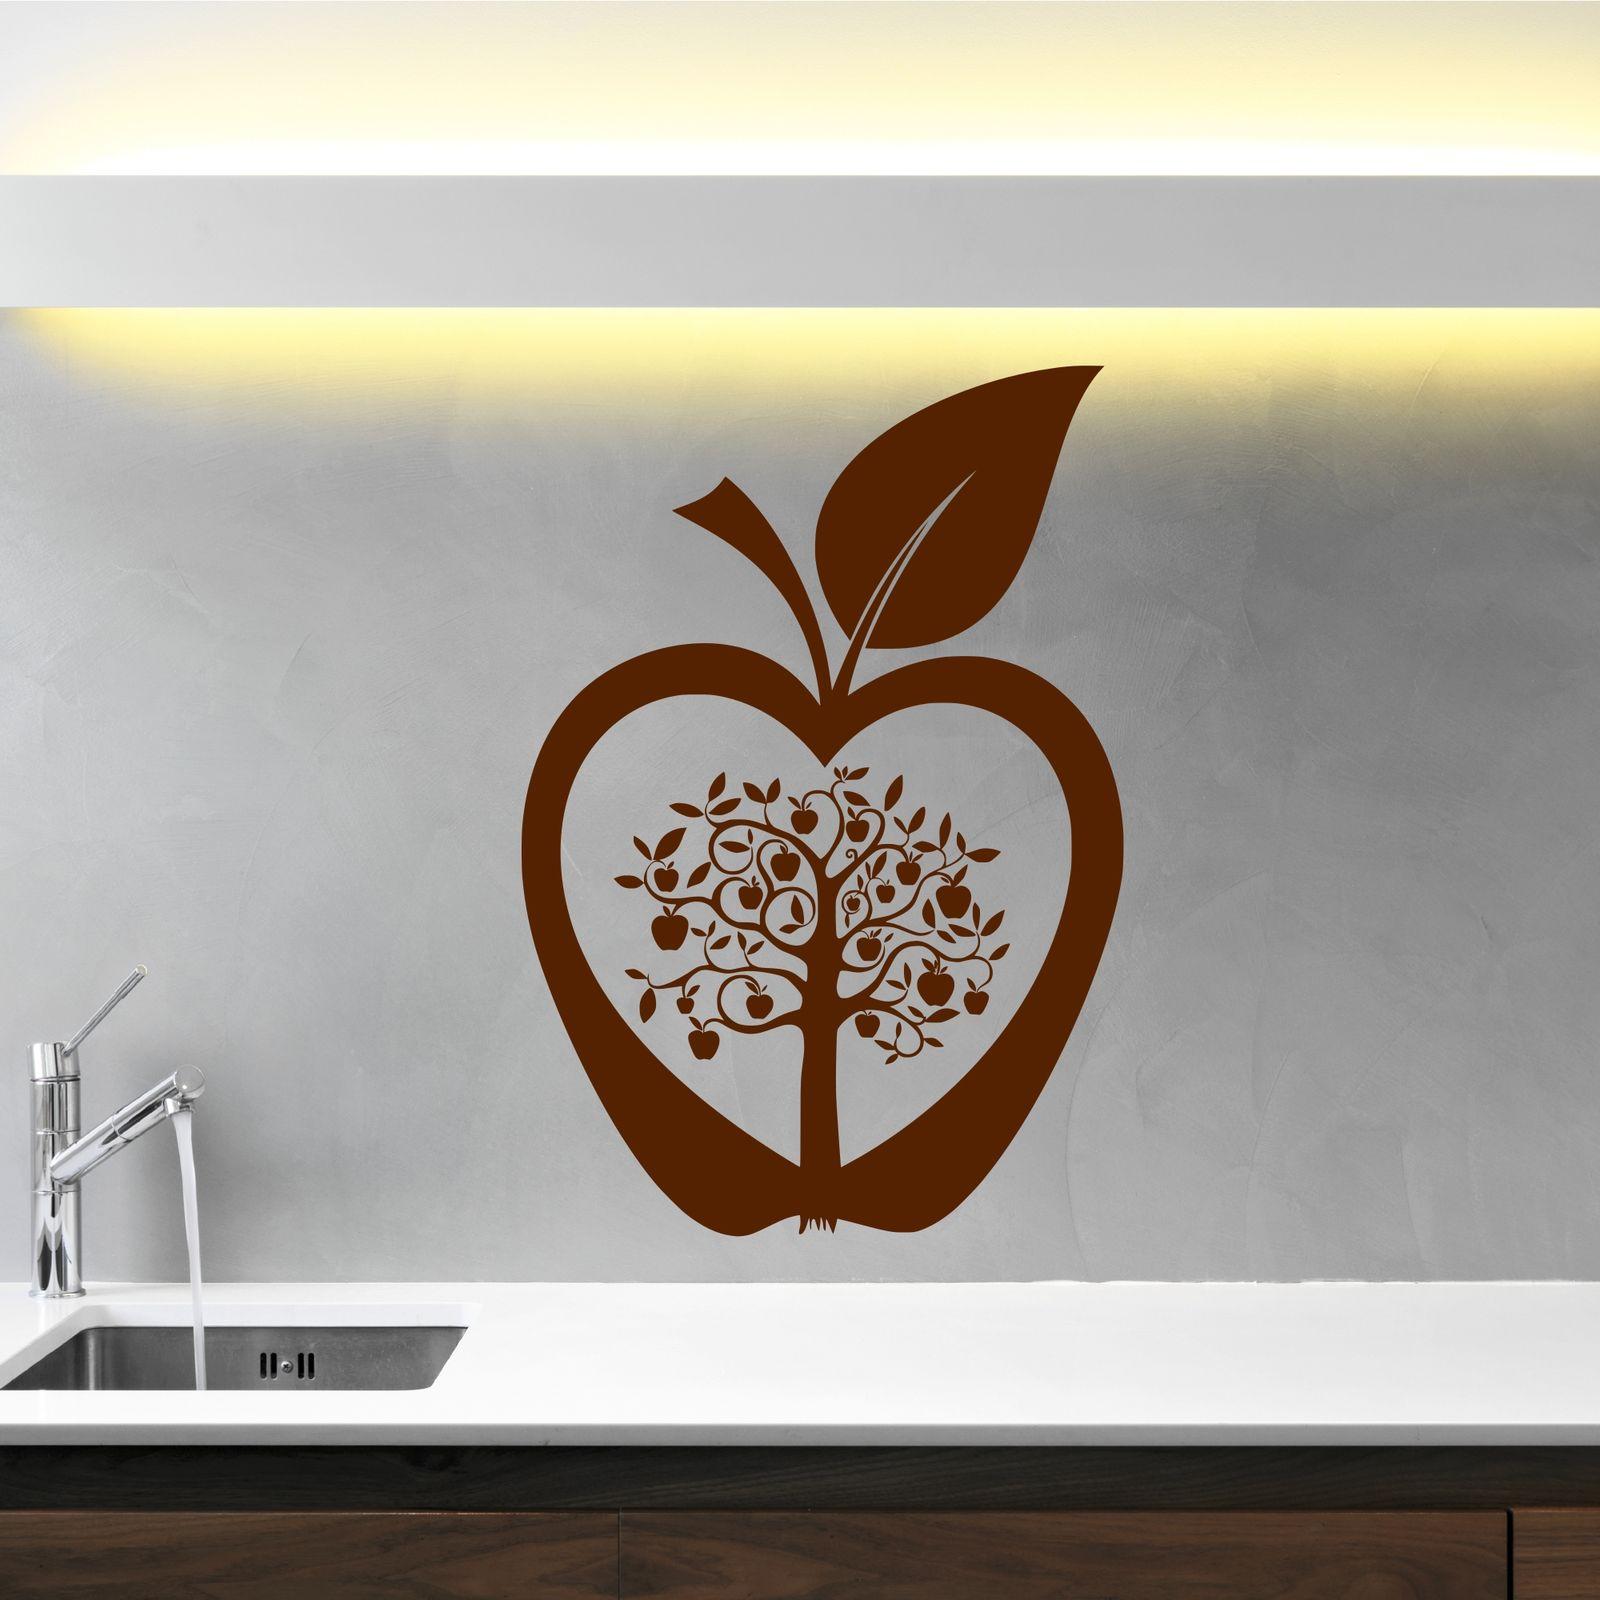 Wall Art Transfer Stickers : Kitchen apple tree flower modern wall art sticker decal